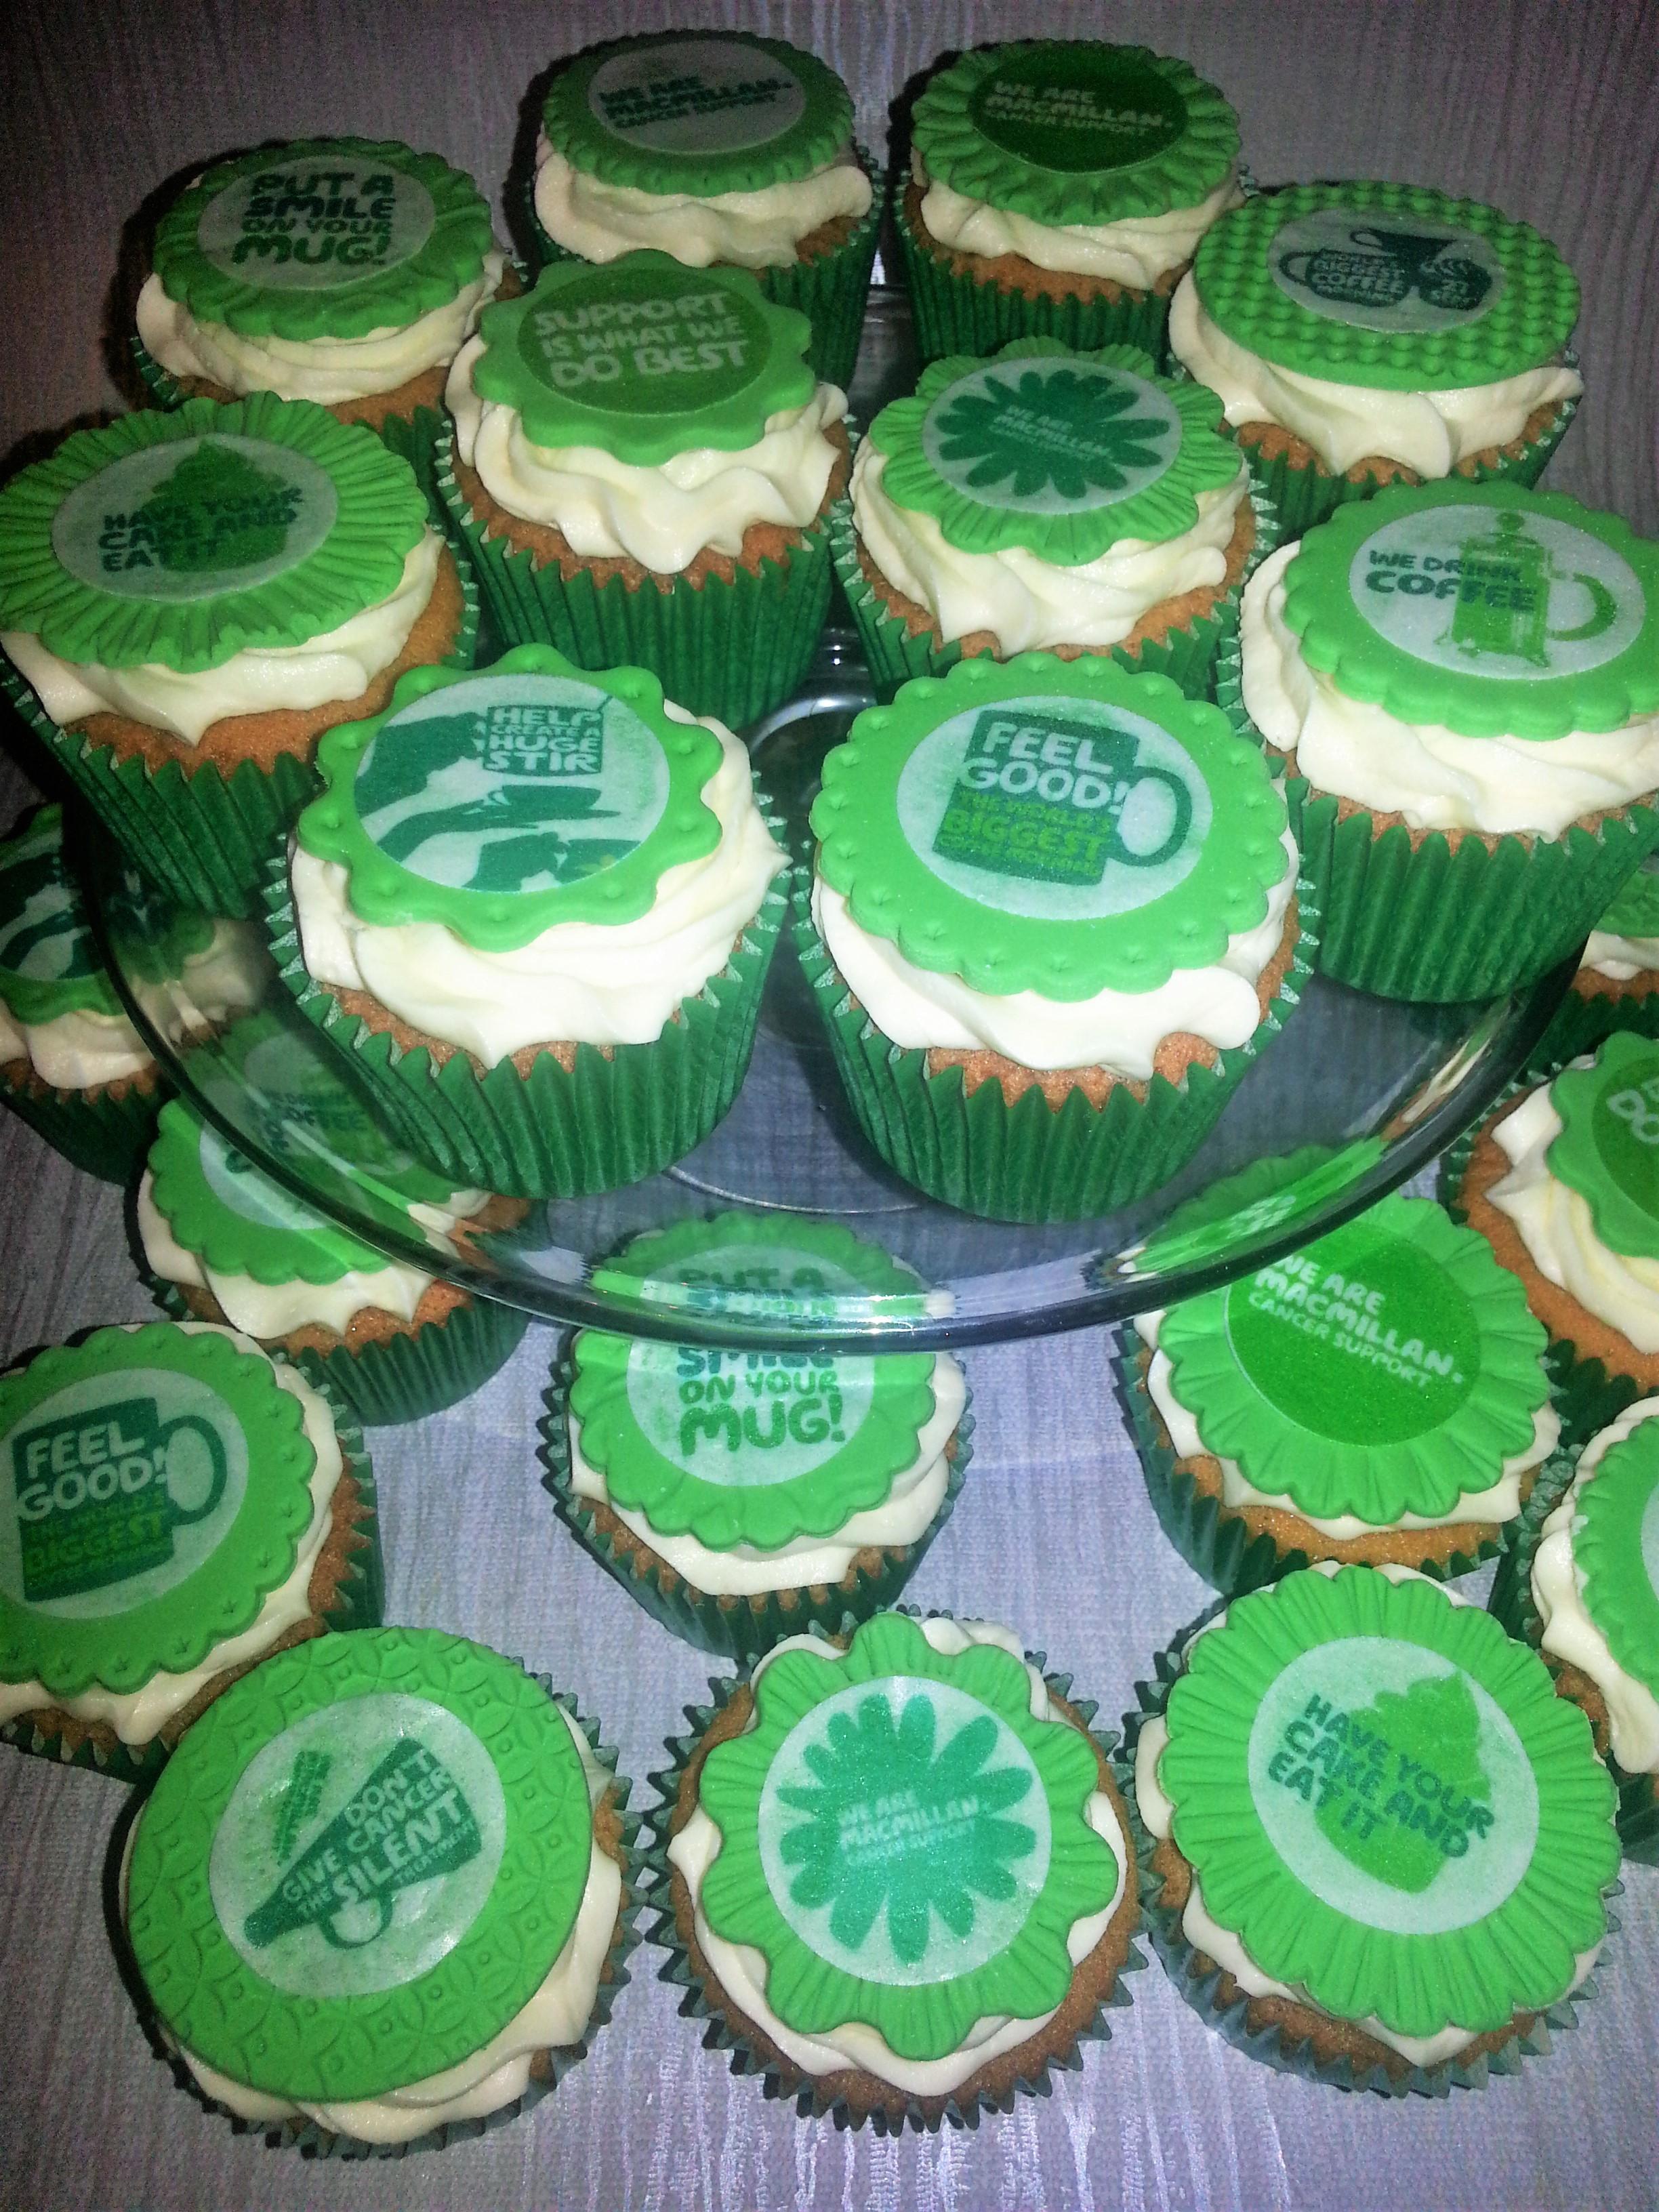 Macmillan Cupcakes